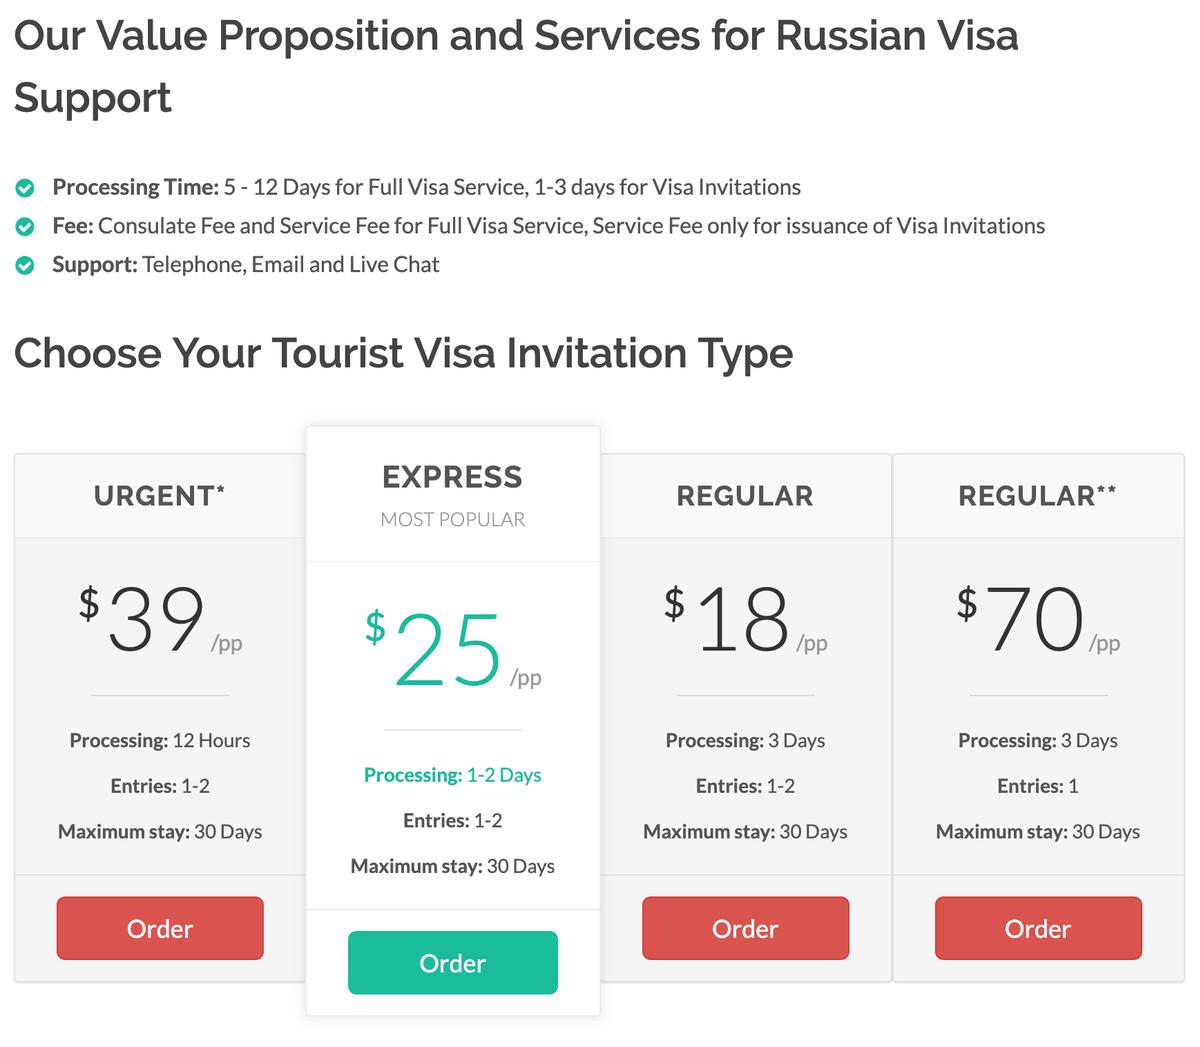 Visado_para_viajar_a_Rusia